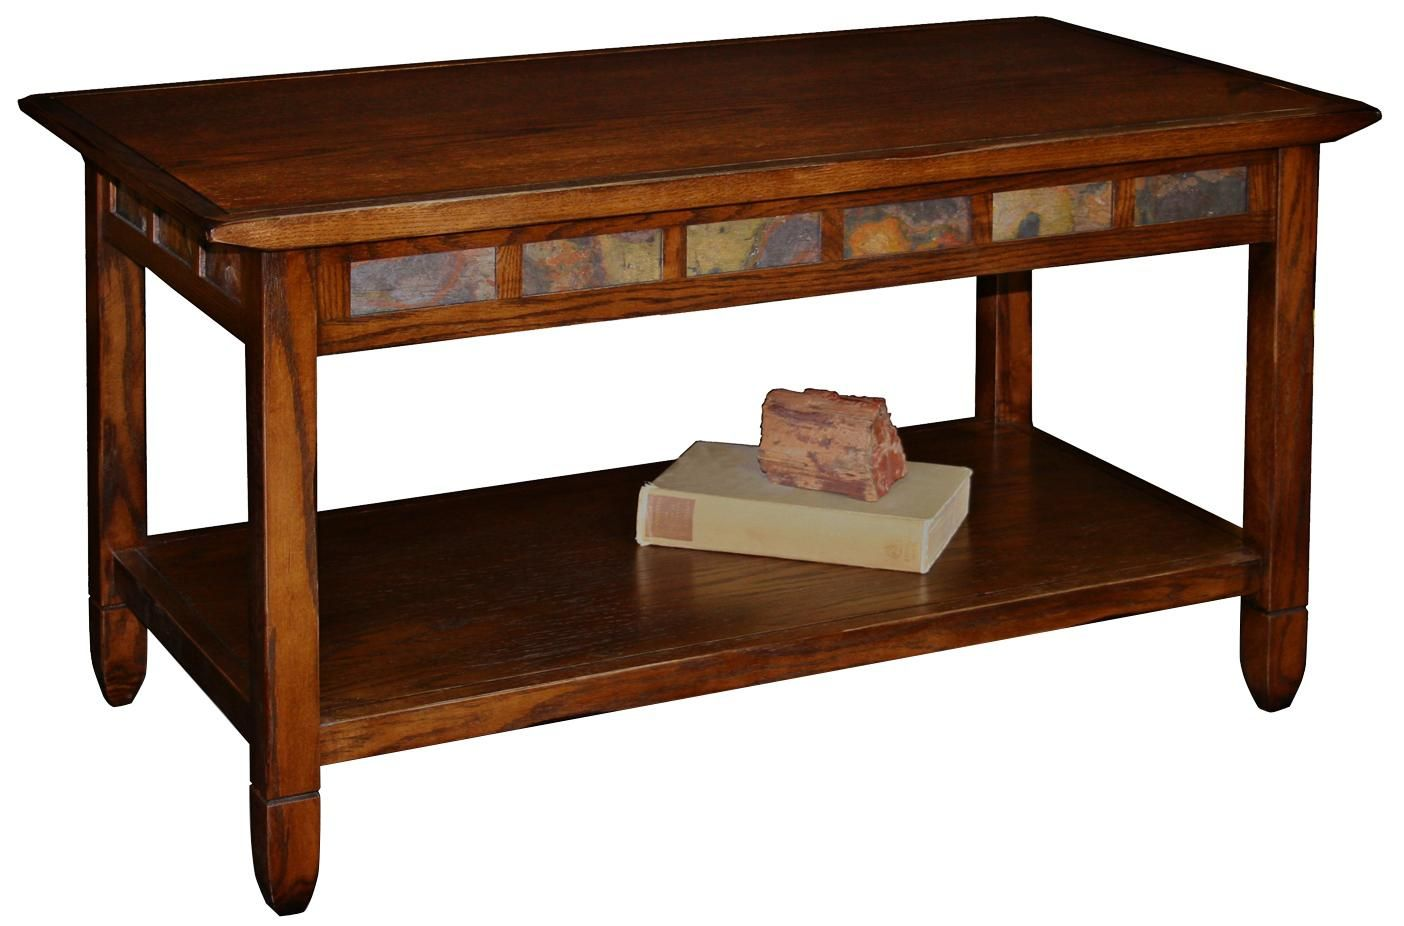 Rustic Oak And Slate Rectangle Coffee Table X8379 Lamps Plus Coffee Table Rectangle Coffee Table Slate Coffee Table [ 926 x 1404 Pixel ]